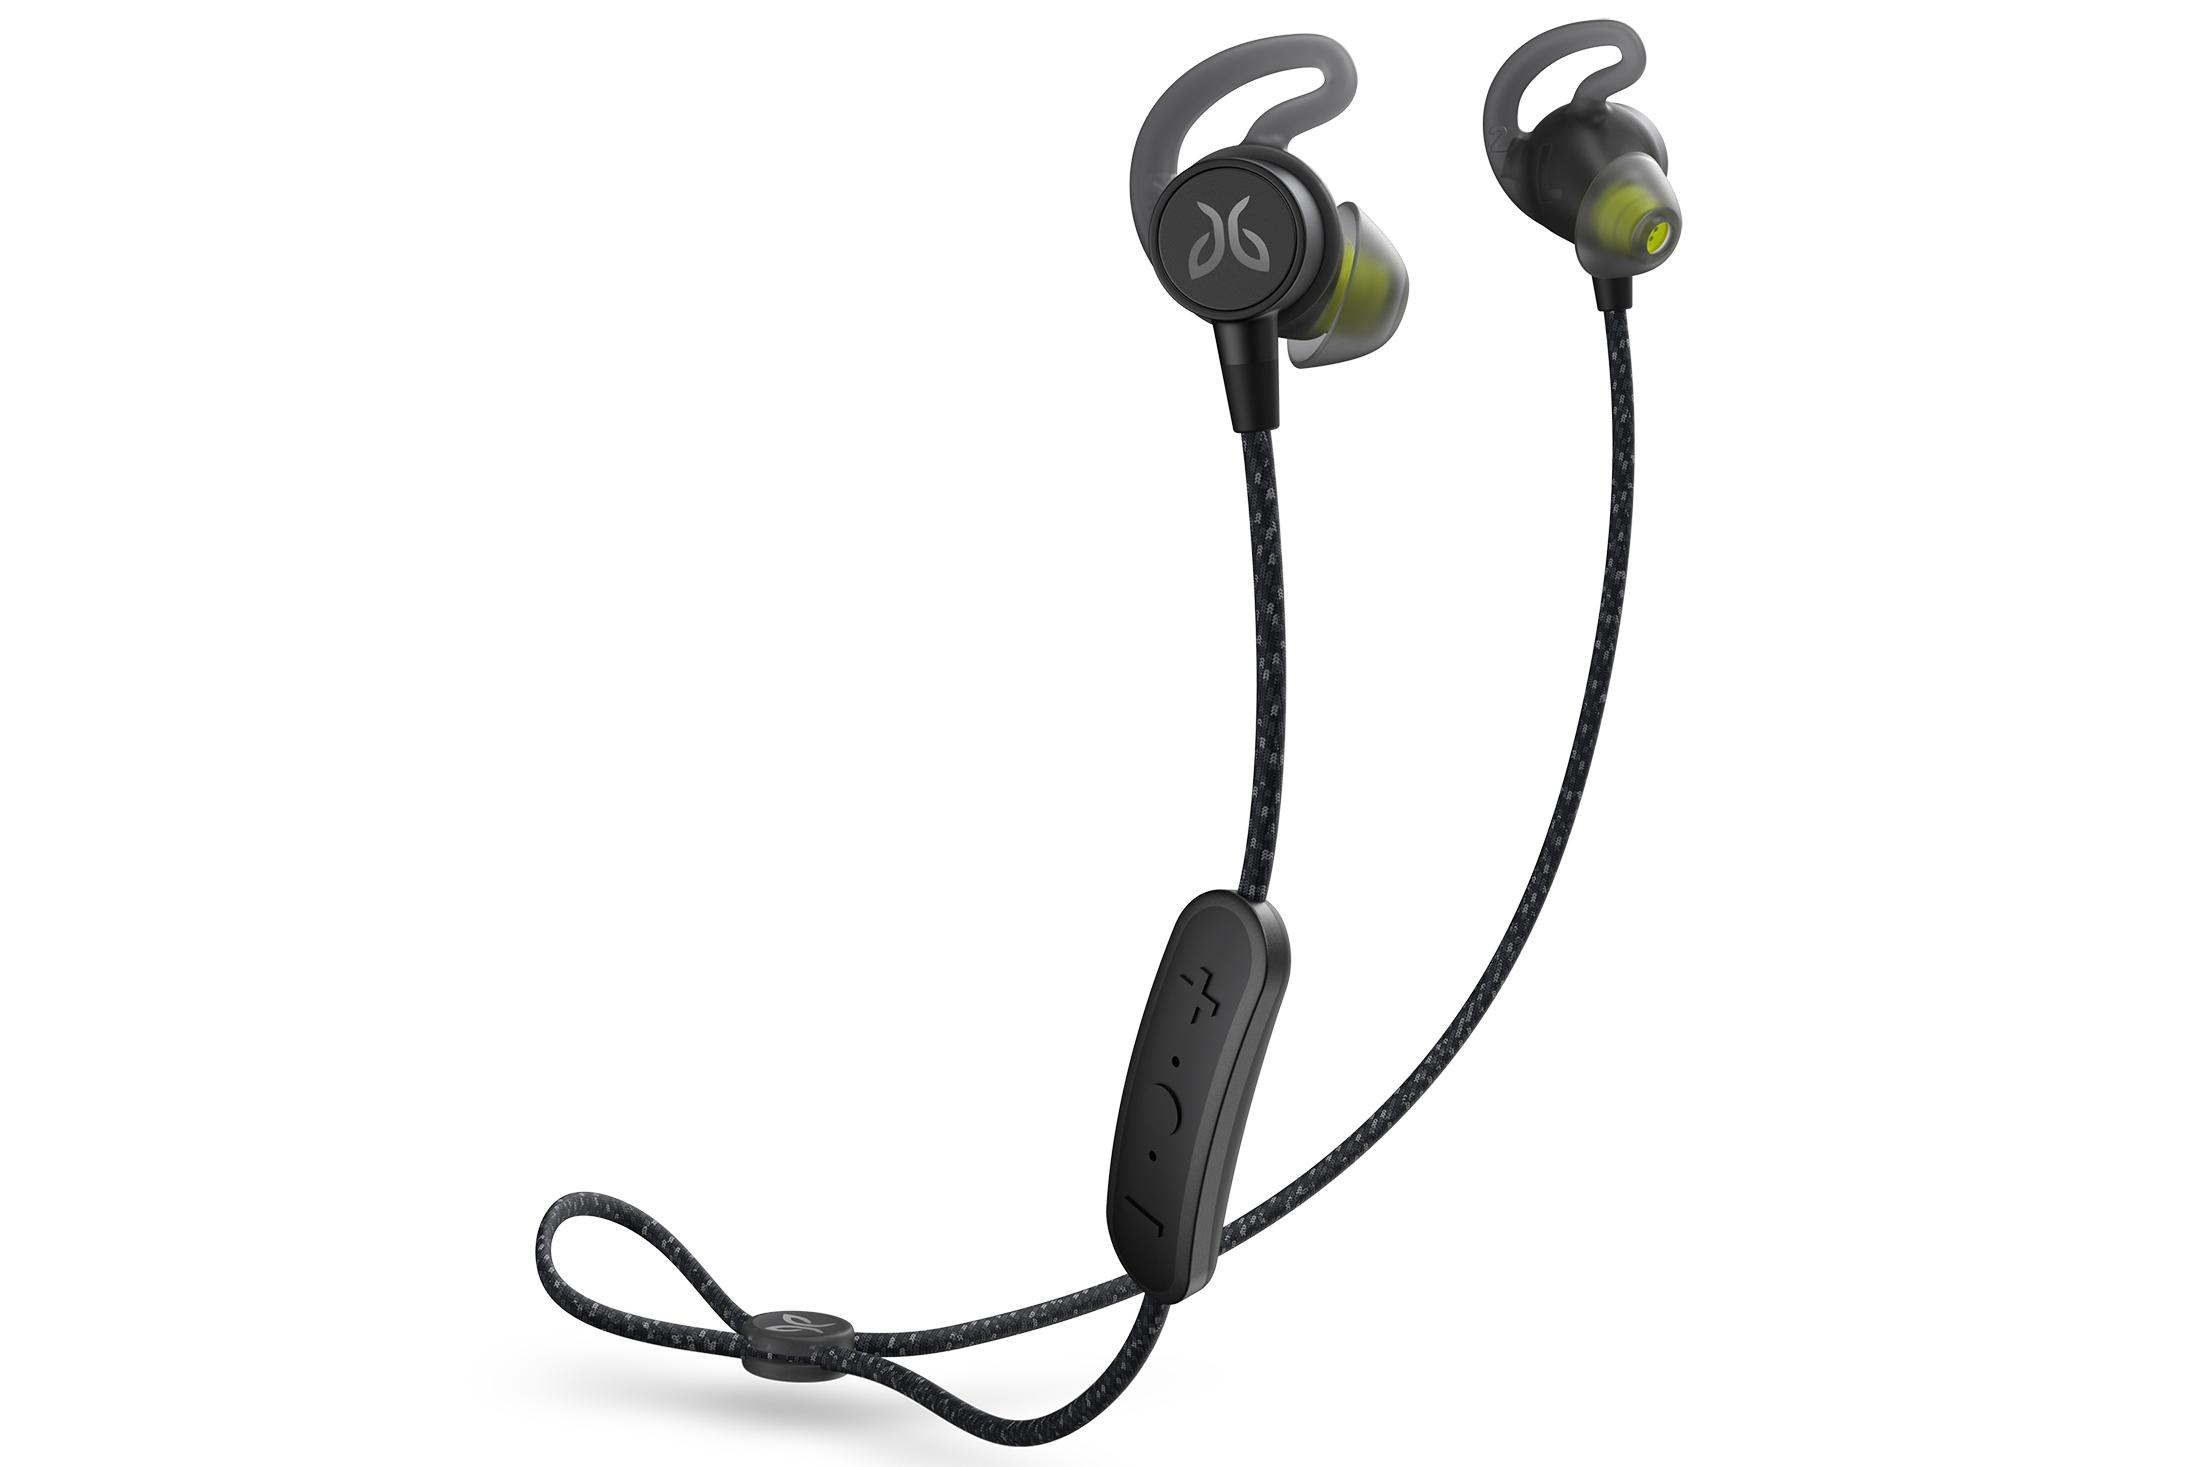 jaybird headphones diagram hard charging: jaybird releases tarah pro wireless ... wiring diagram building noise canceling headphones microphone